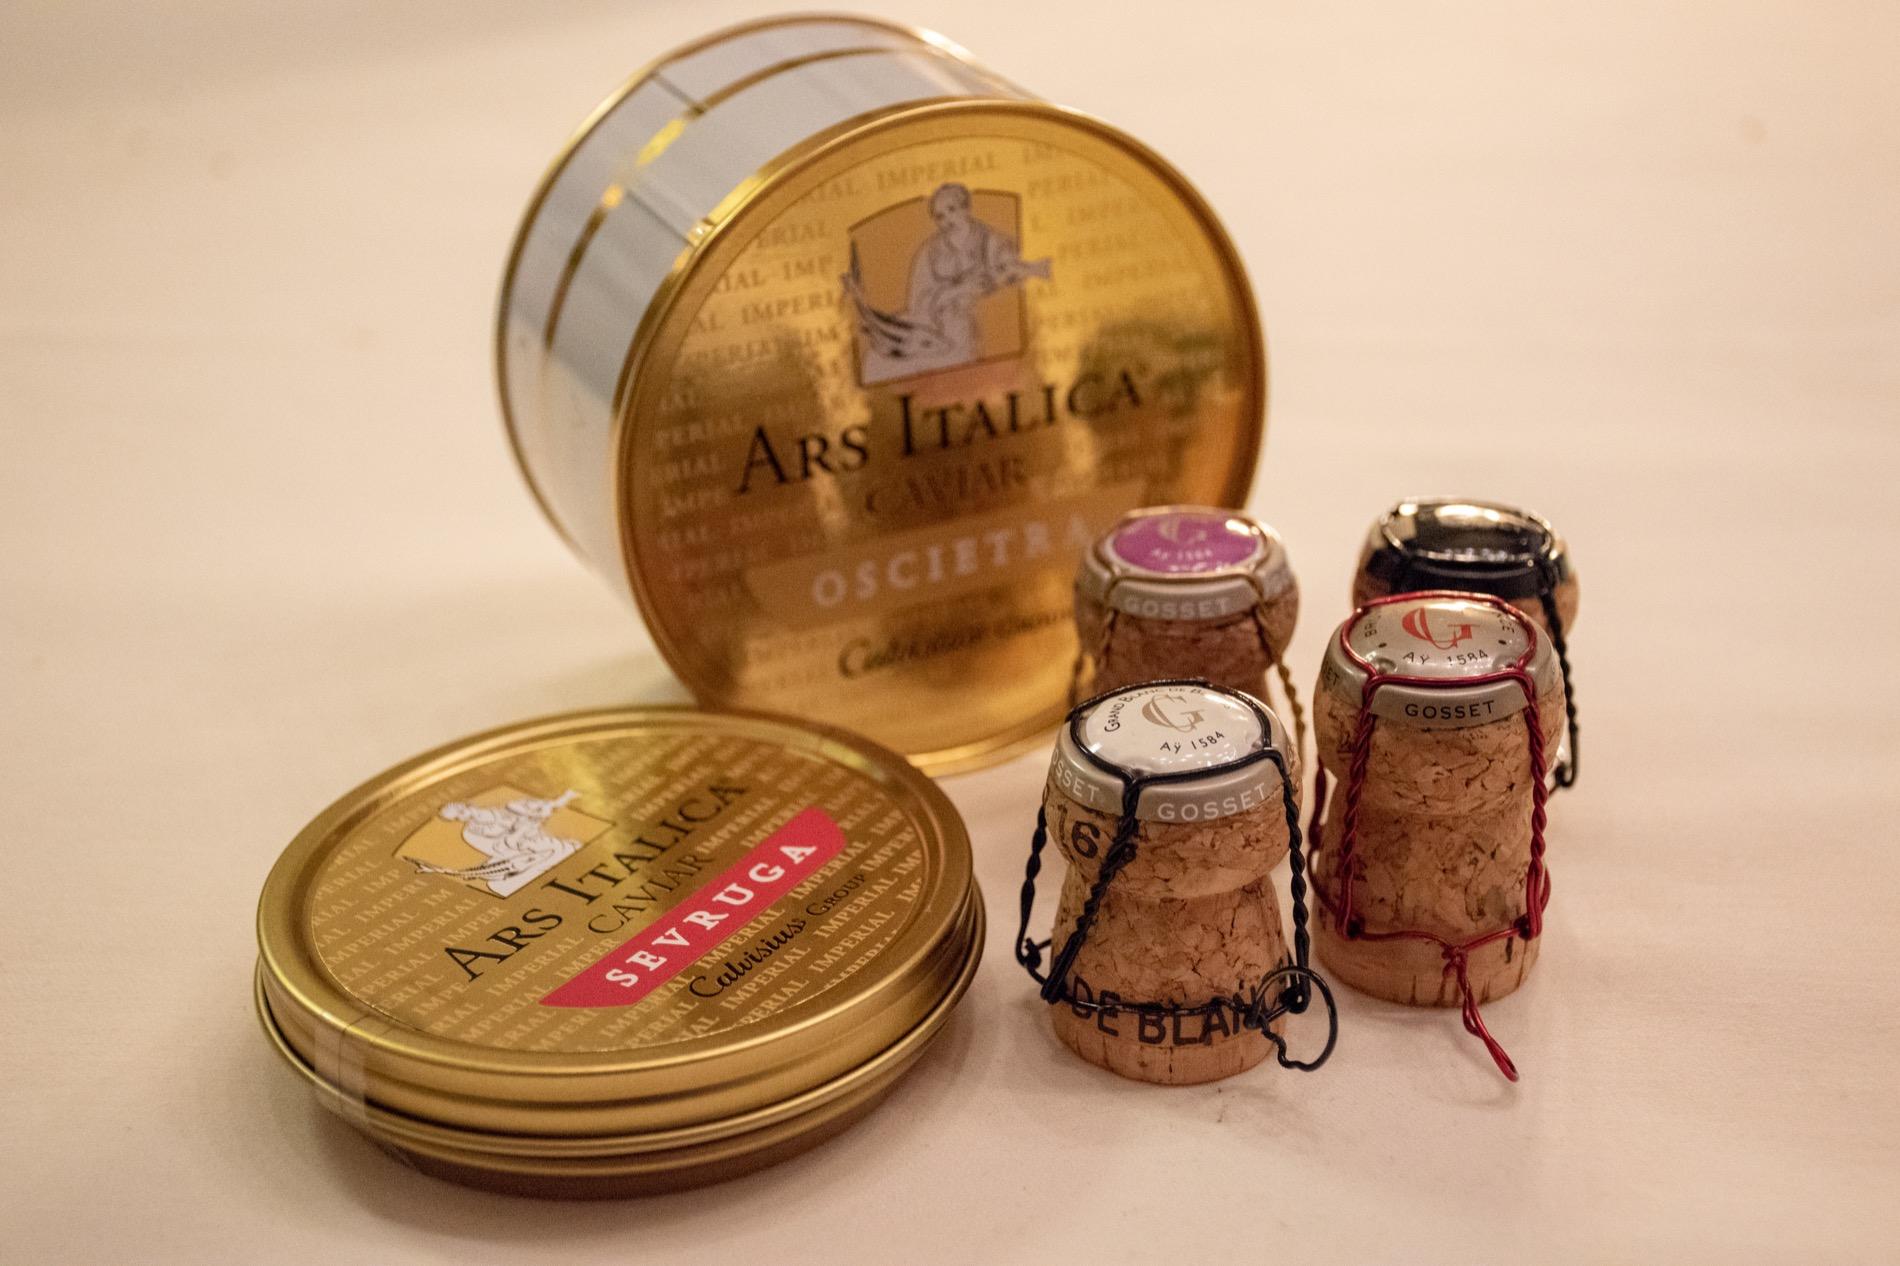 Ars Italica & Champagne Gosset @ Ginevra